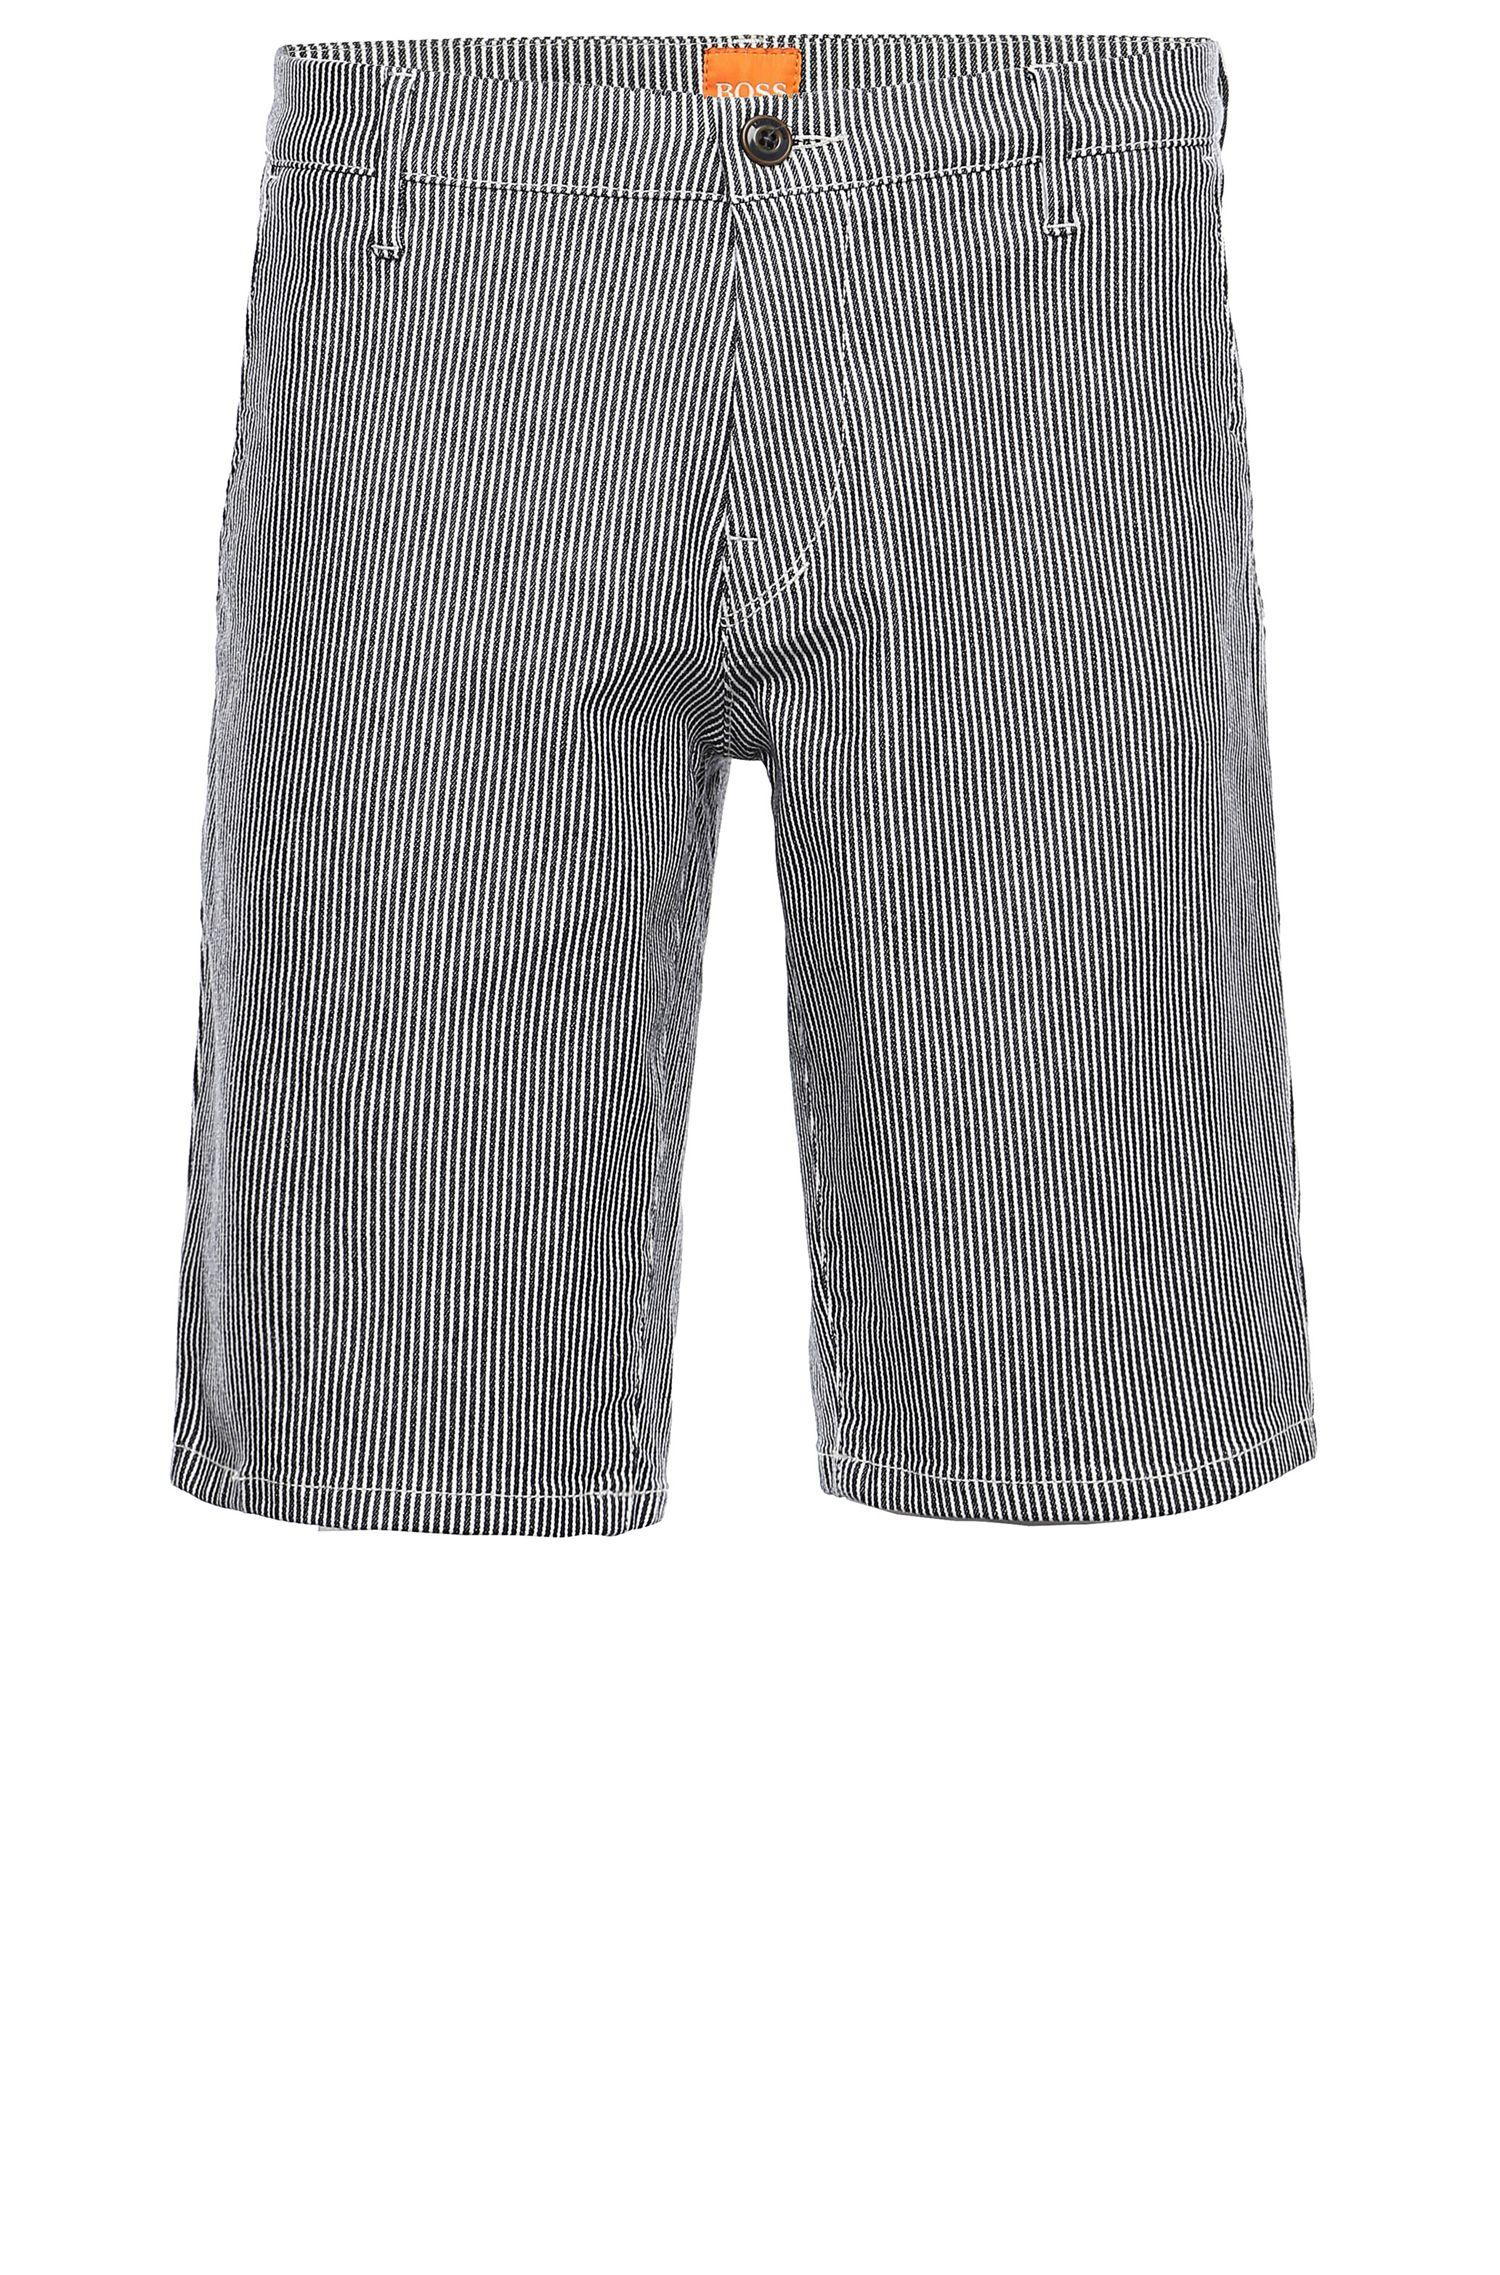 'Sairy-Shorts-W' | Slim Fit, Stretch Cotton Shorts